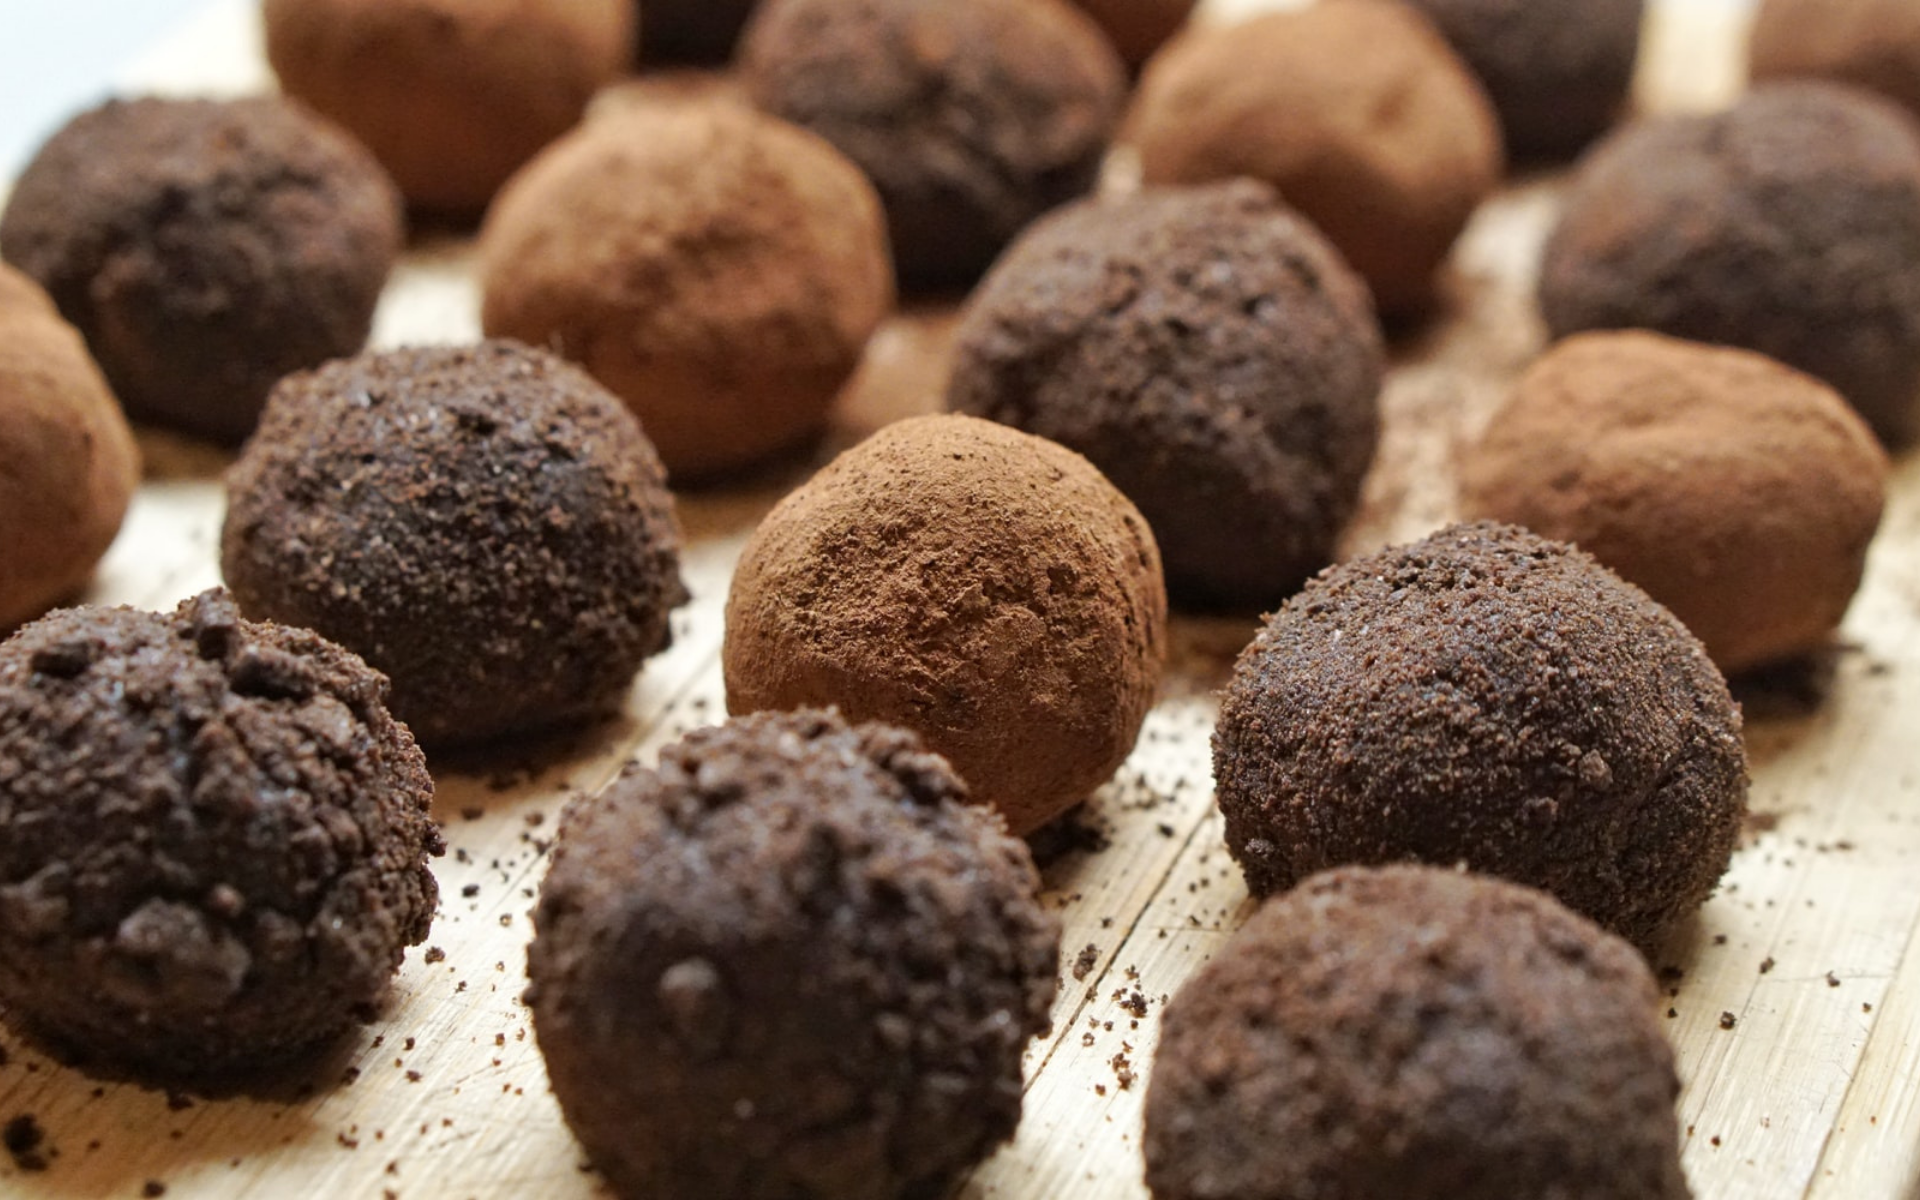 Les truffes & rochers